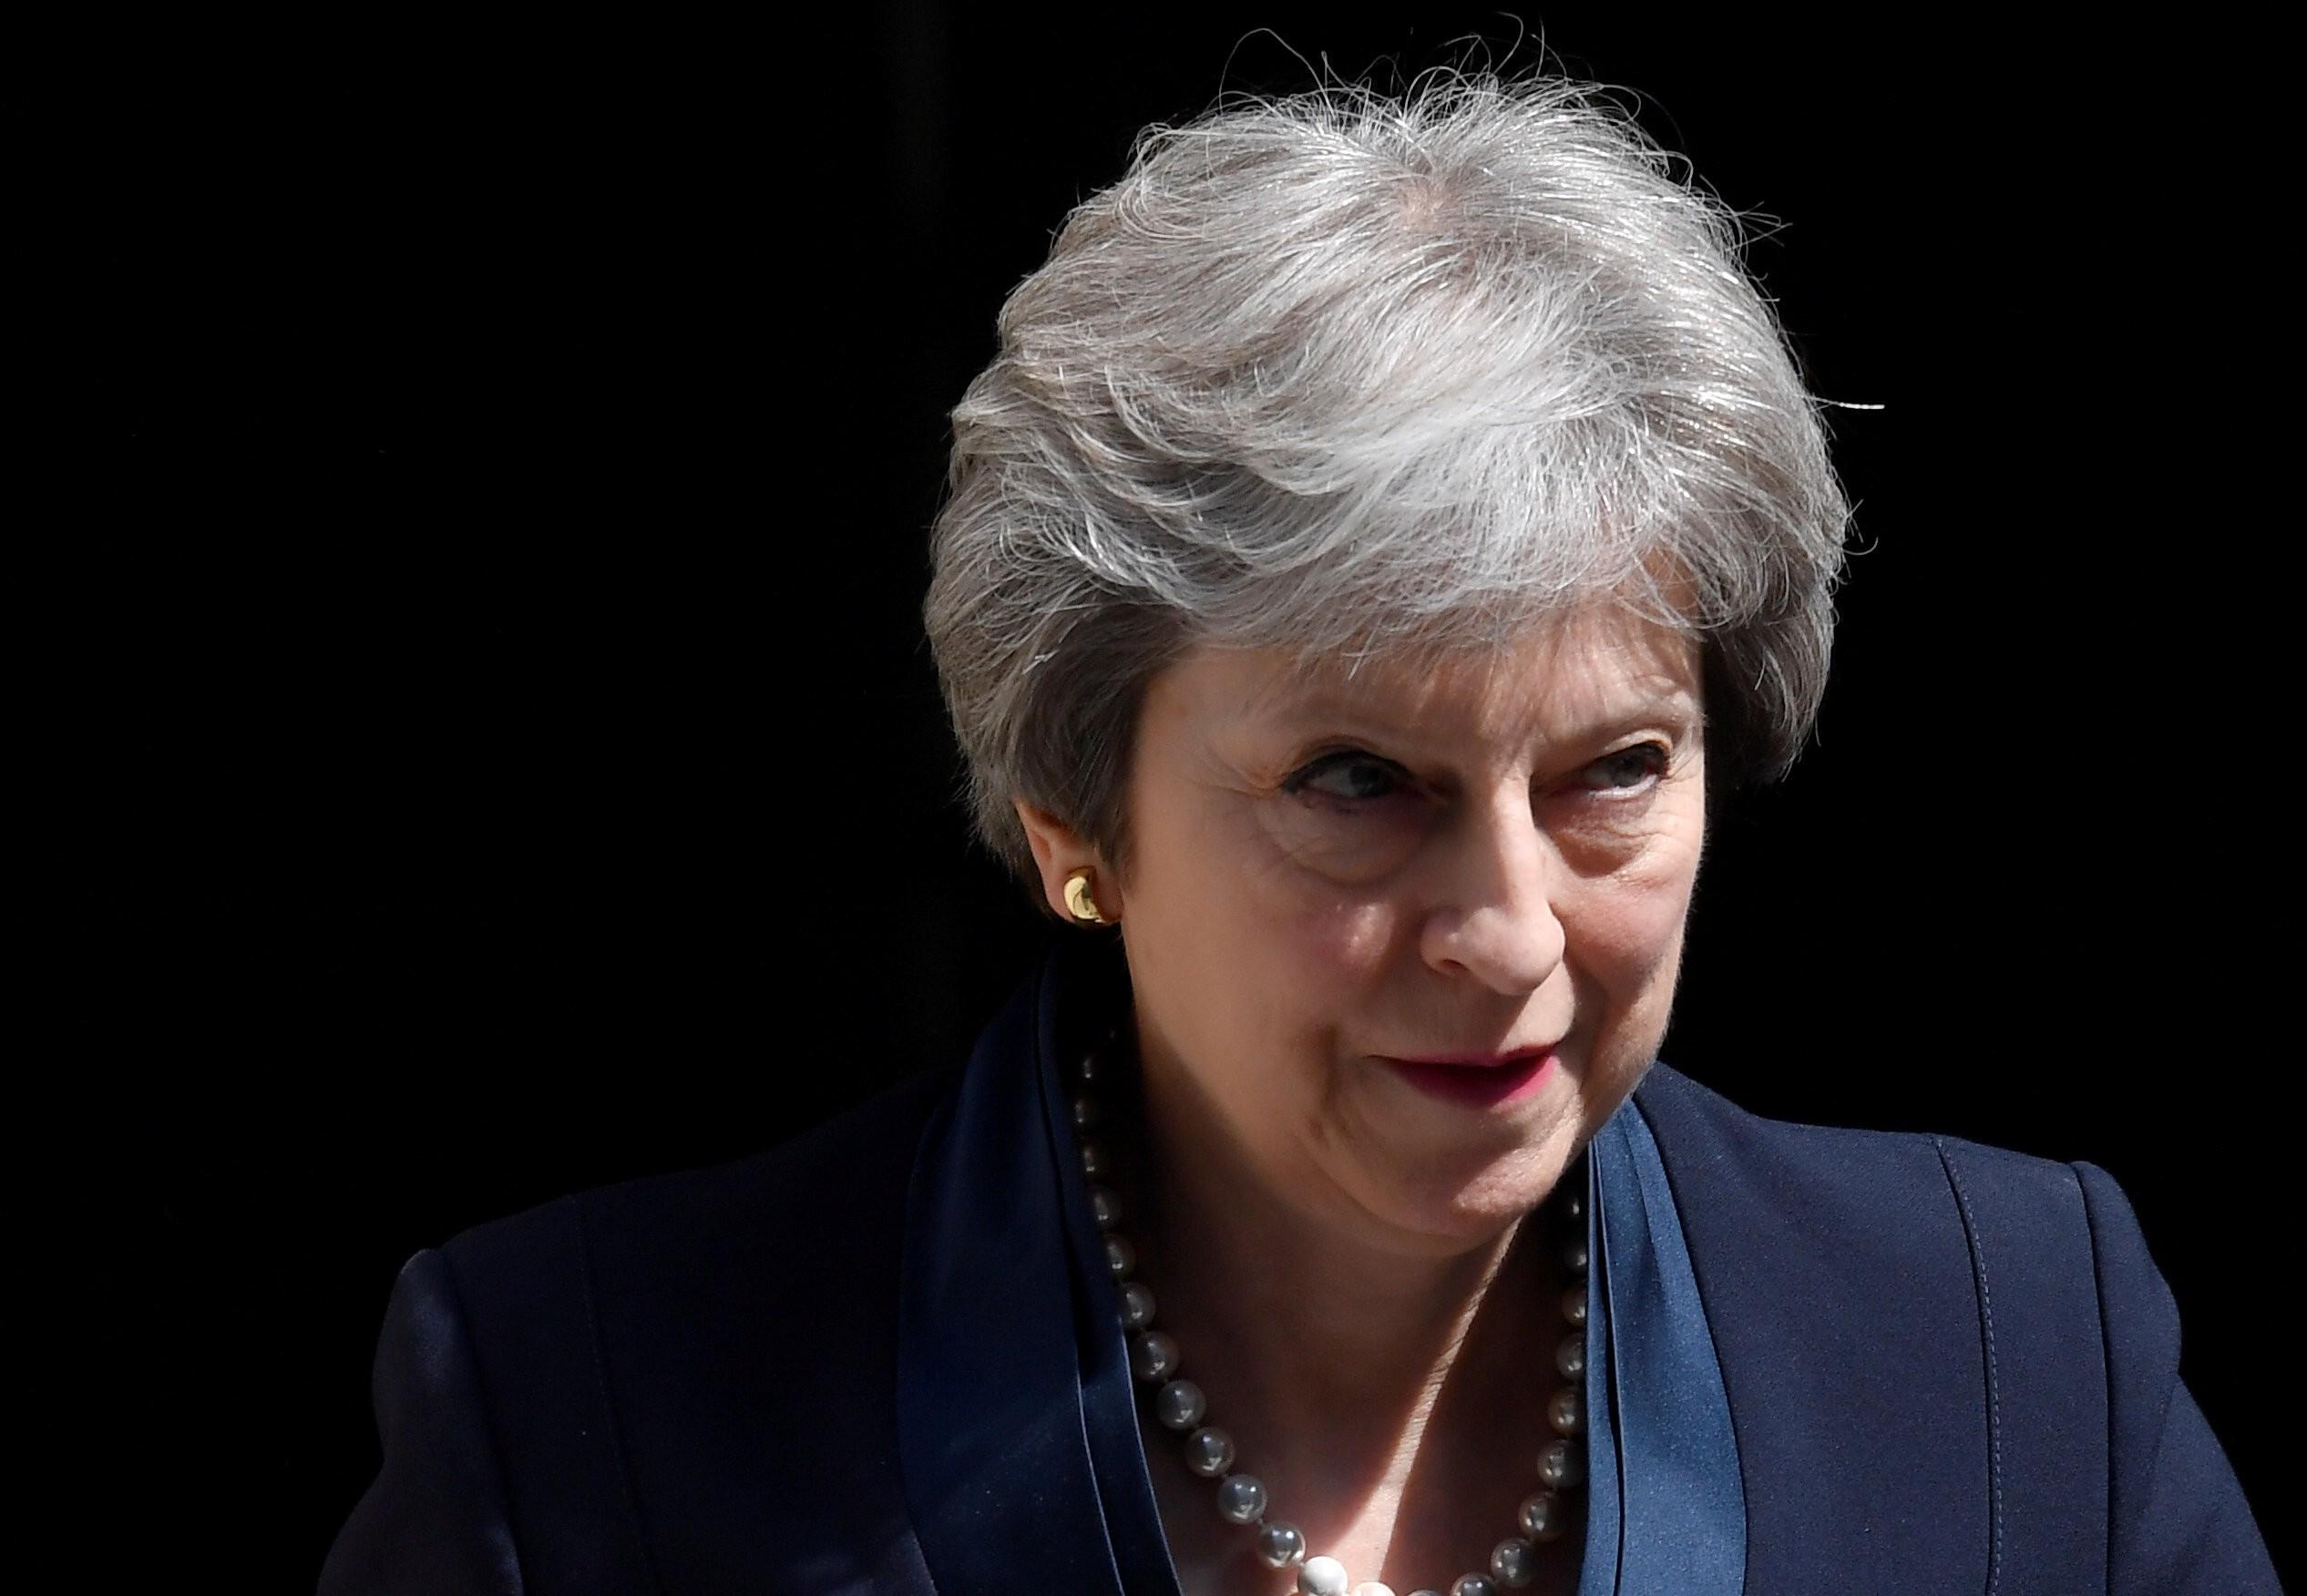 Ex-ministro pede que gabinete do Reino Unido force May a mudar de ideia sobre o Brexit